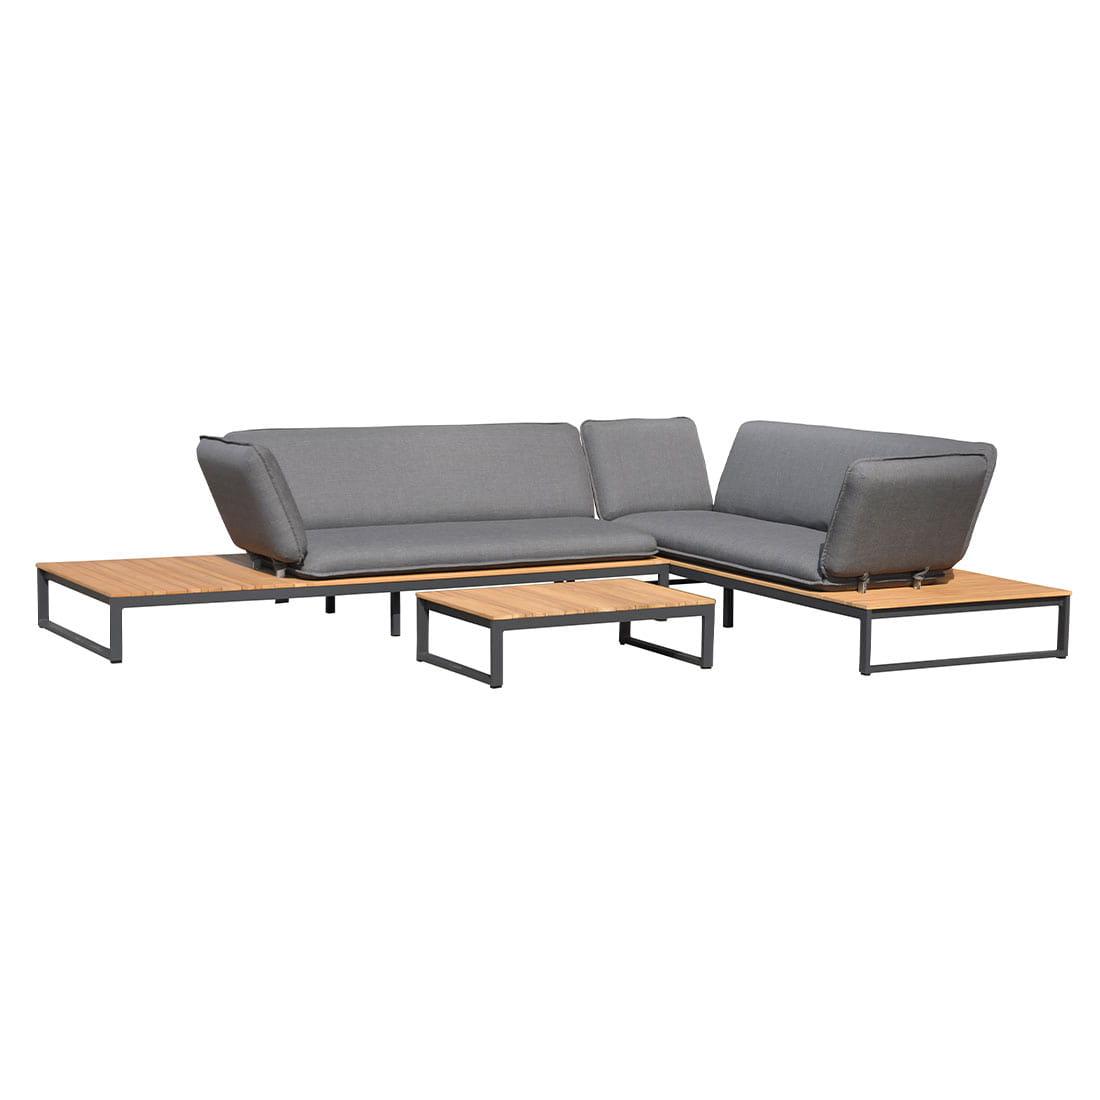 Full Size of Outliv Ancona Sofagruppe 3tlg Aluminium Teak Nanoteideen Und Garten Loungemöbel Günstig Holz Wohnzimmer Outliv Loungemöbel